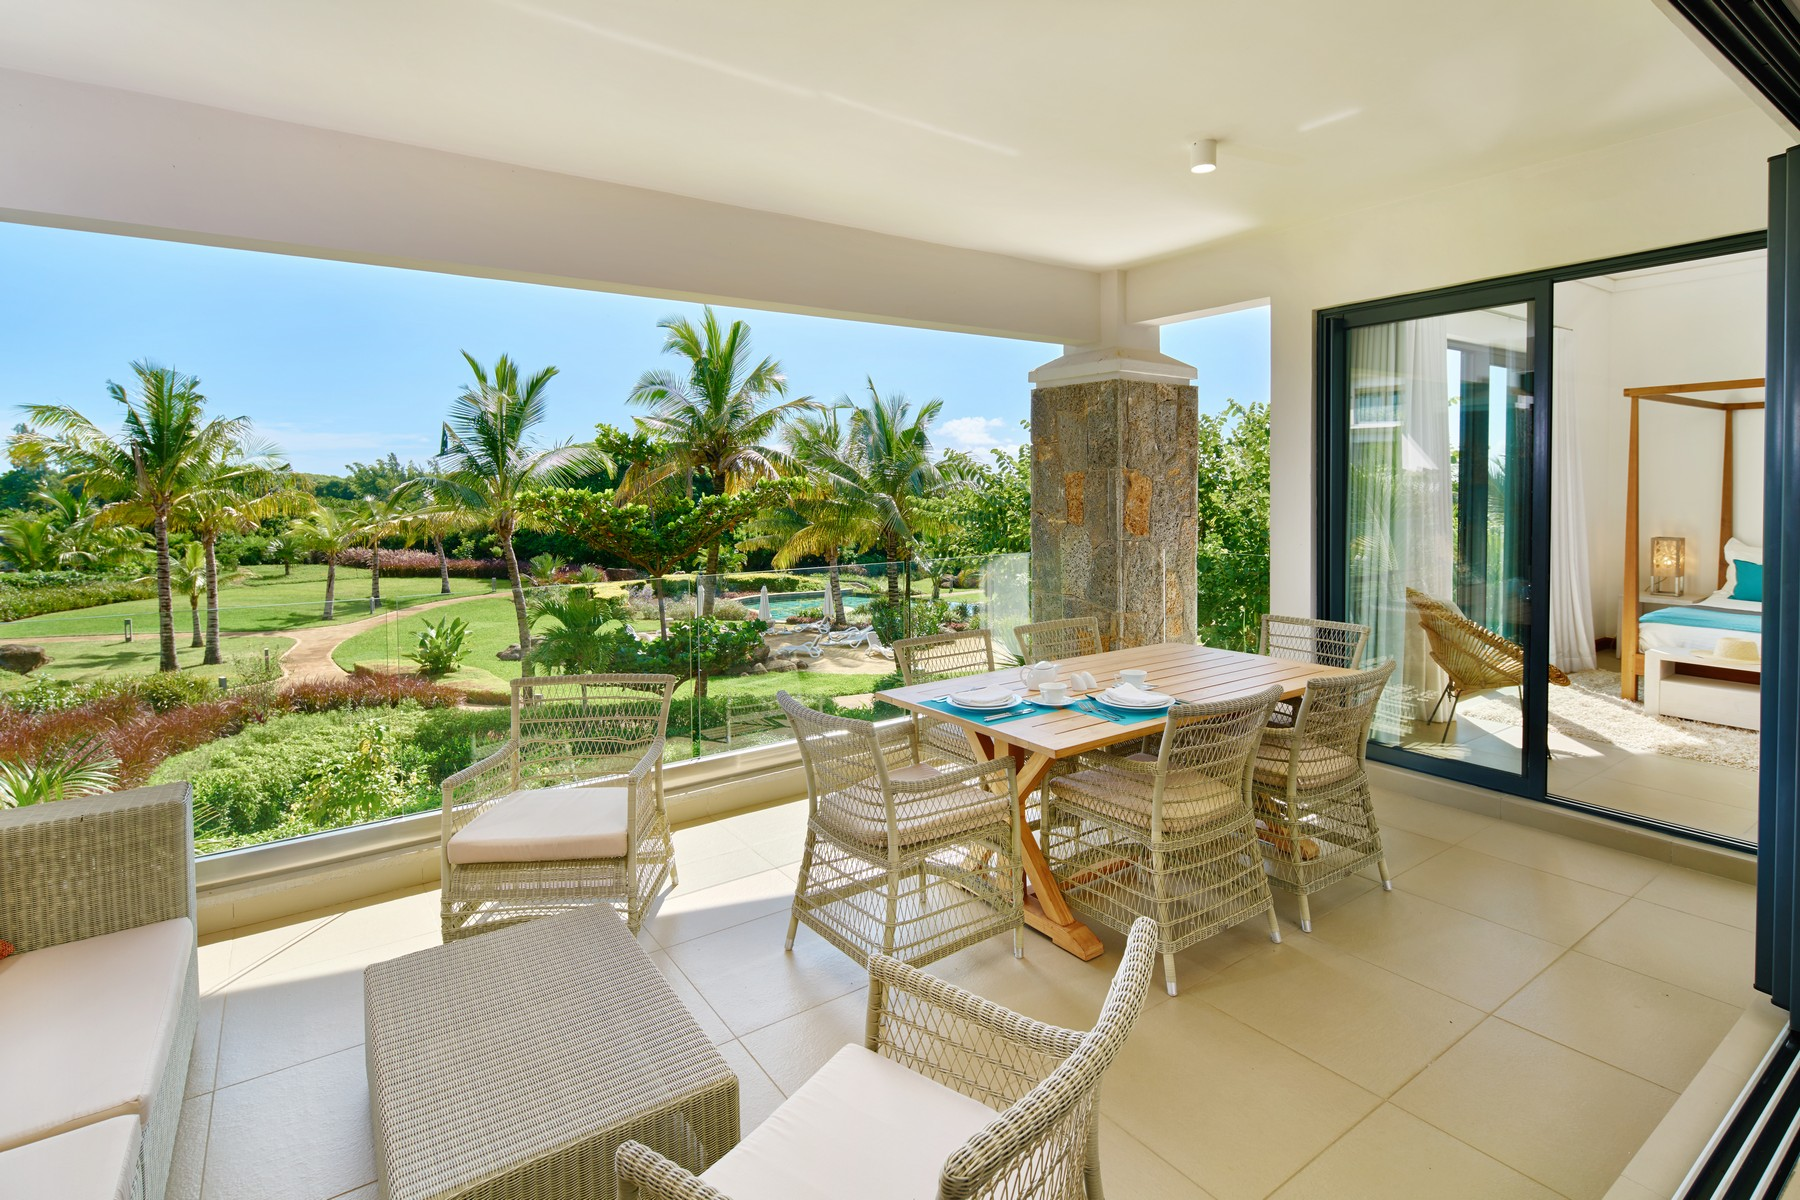 Квартира для того Продажа на Freehold Oceanfront Townhouse, Coralis, Azuri Roches Noires, Riviere Du Rempart, Маврикий